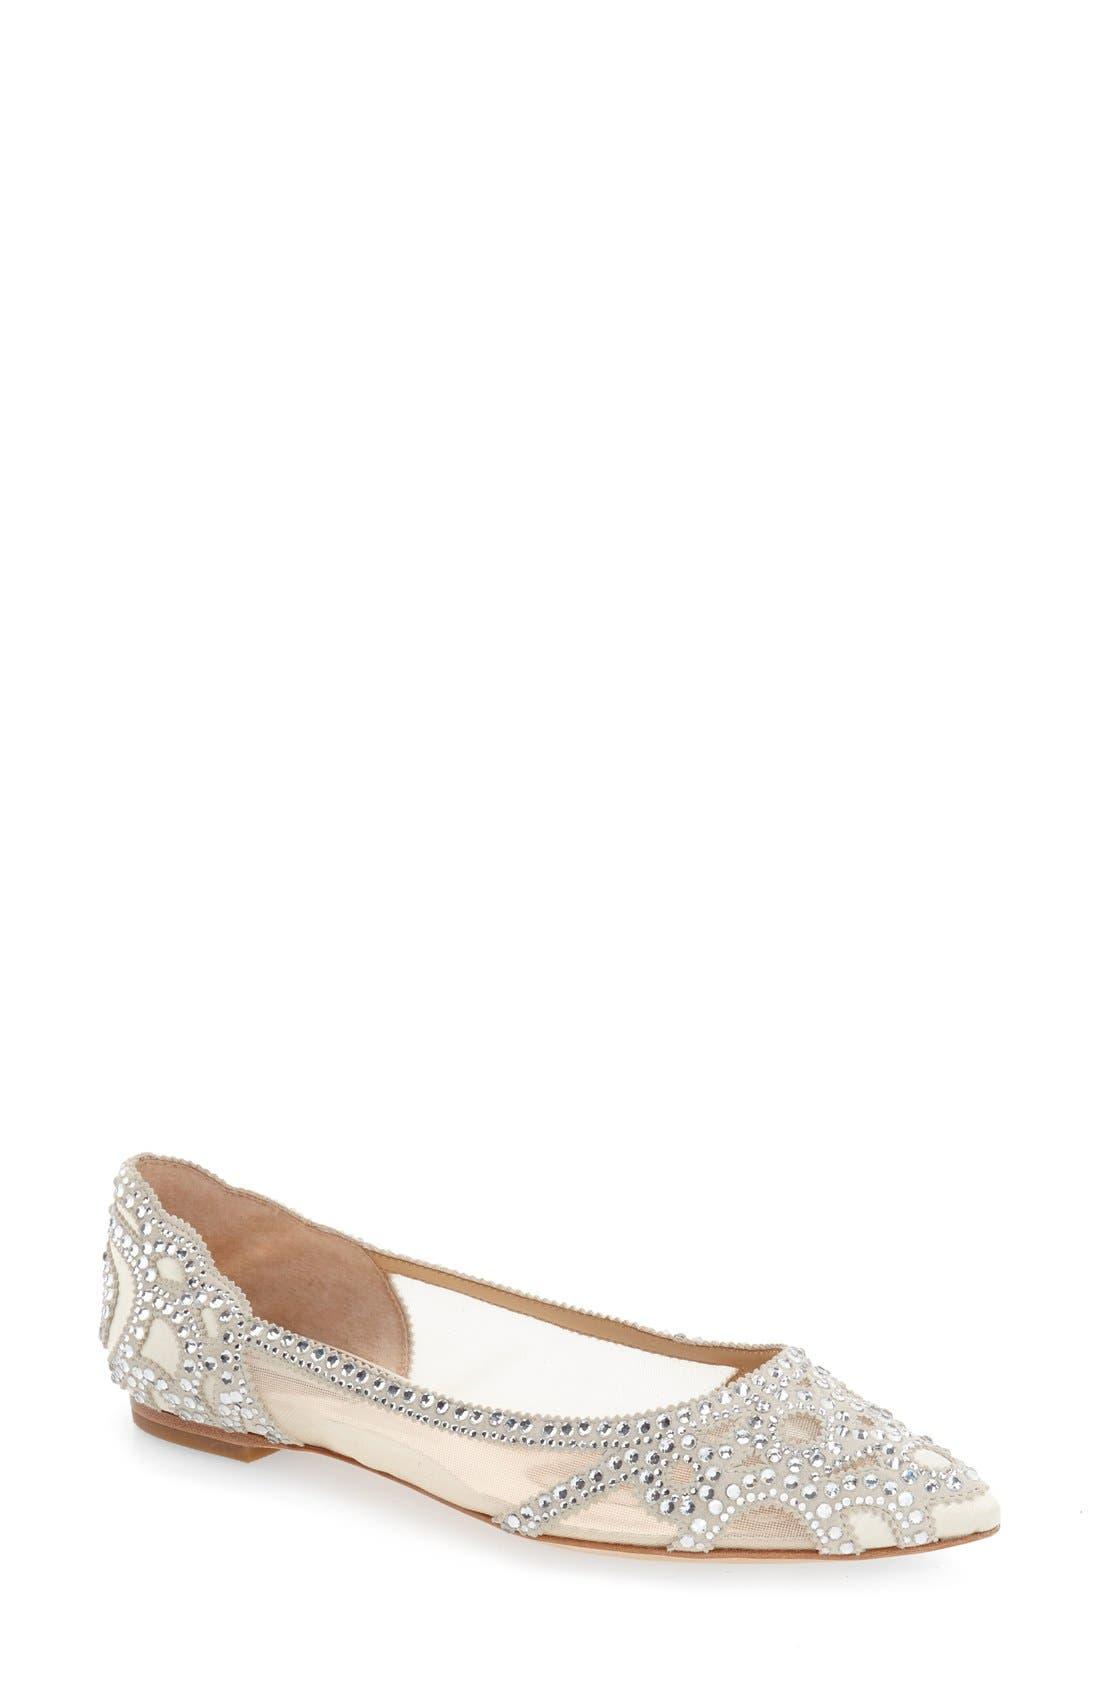 Women's Badgley Mischka Gigi Crystal Pointed Toe Flat